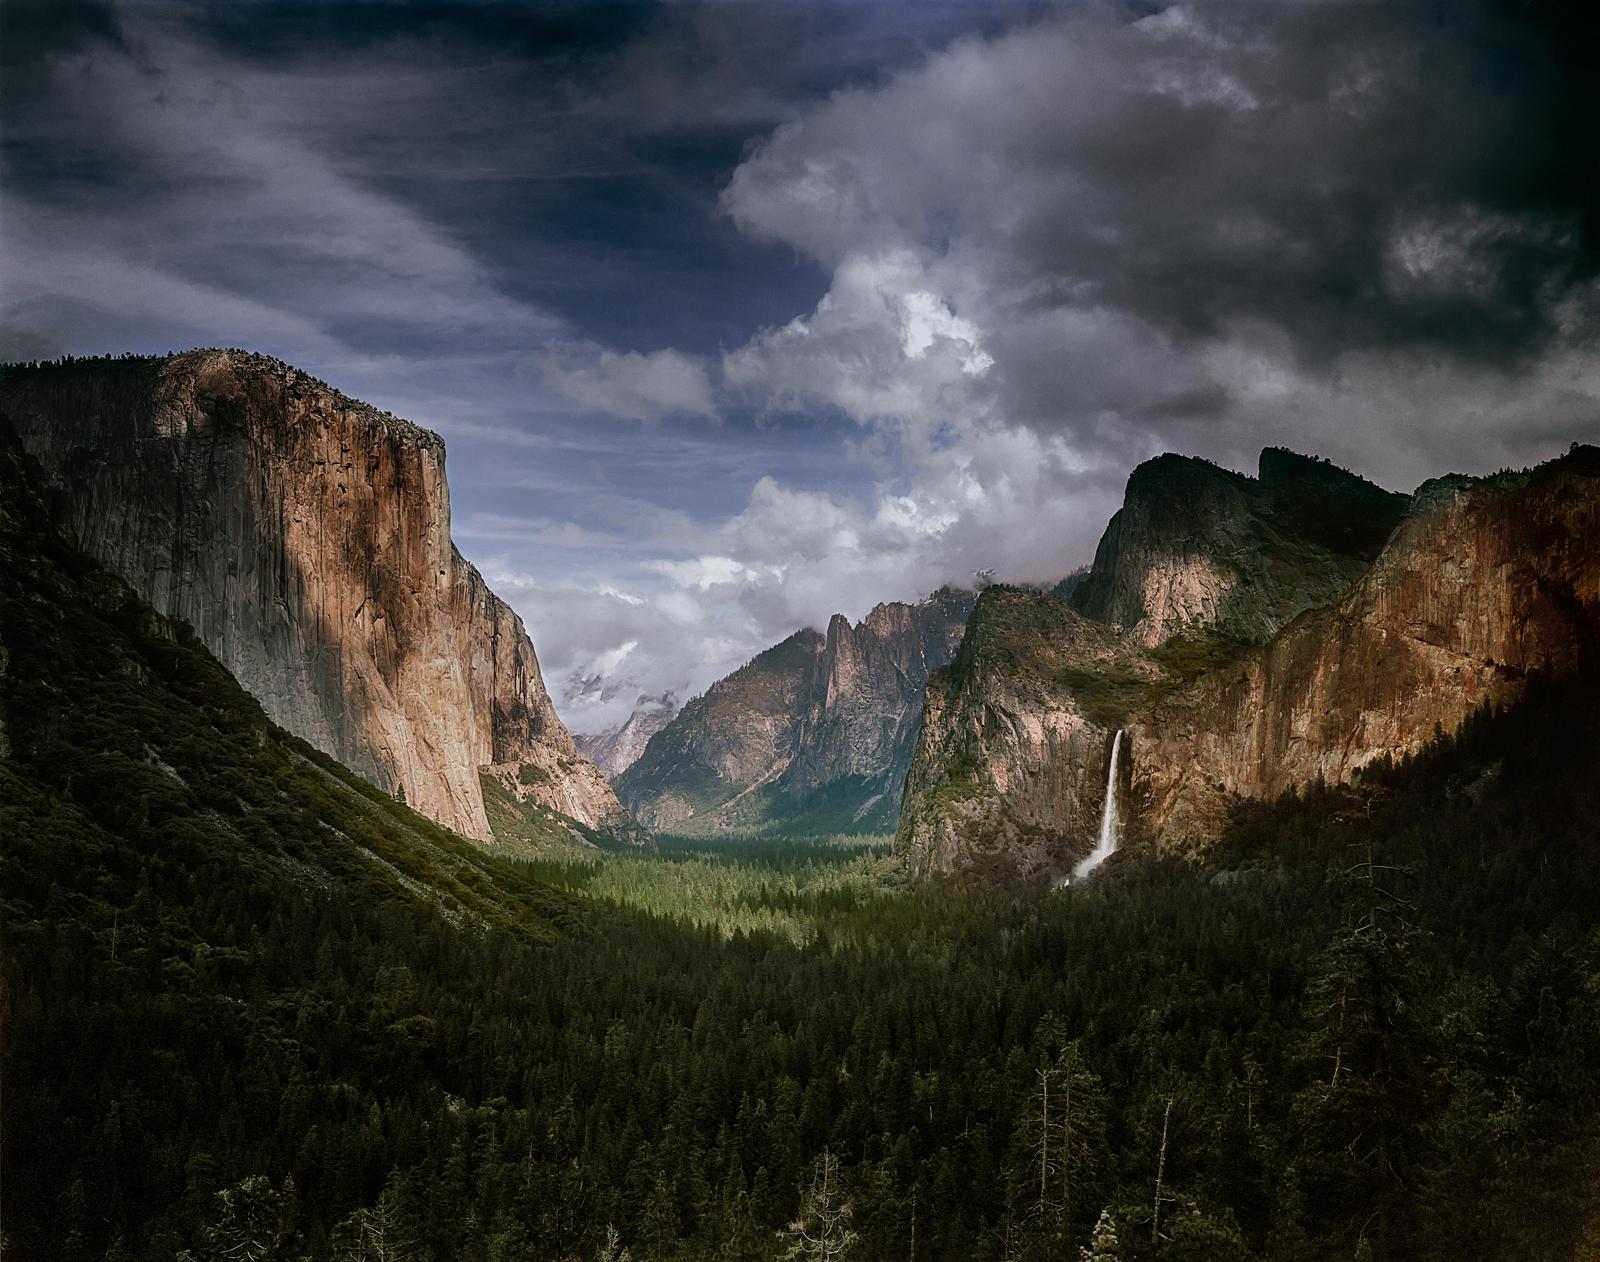 Idyllic Yosemite by AugenStudios